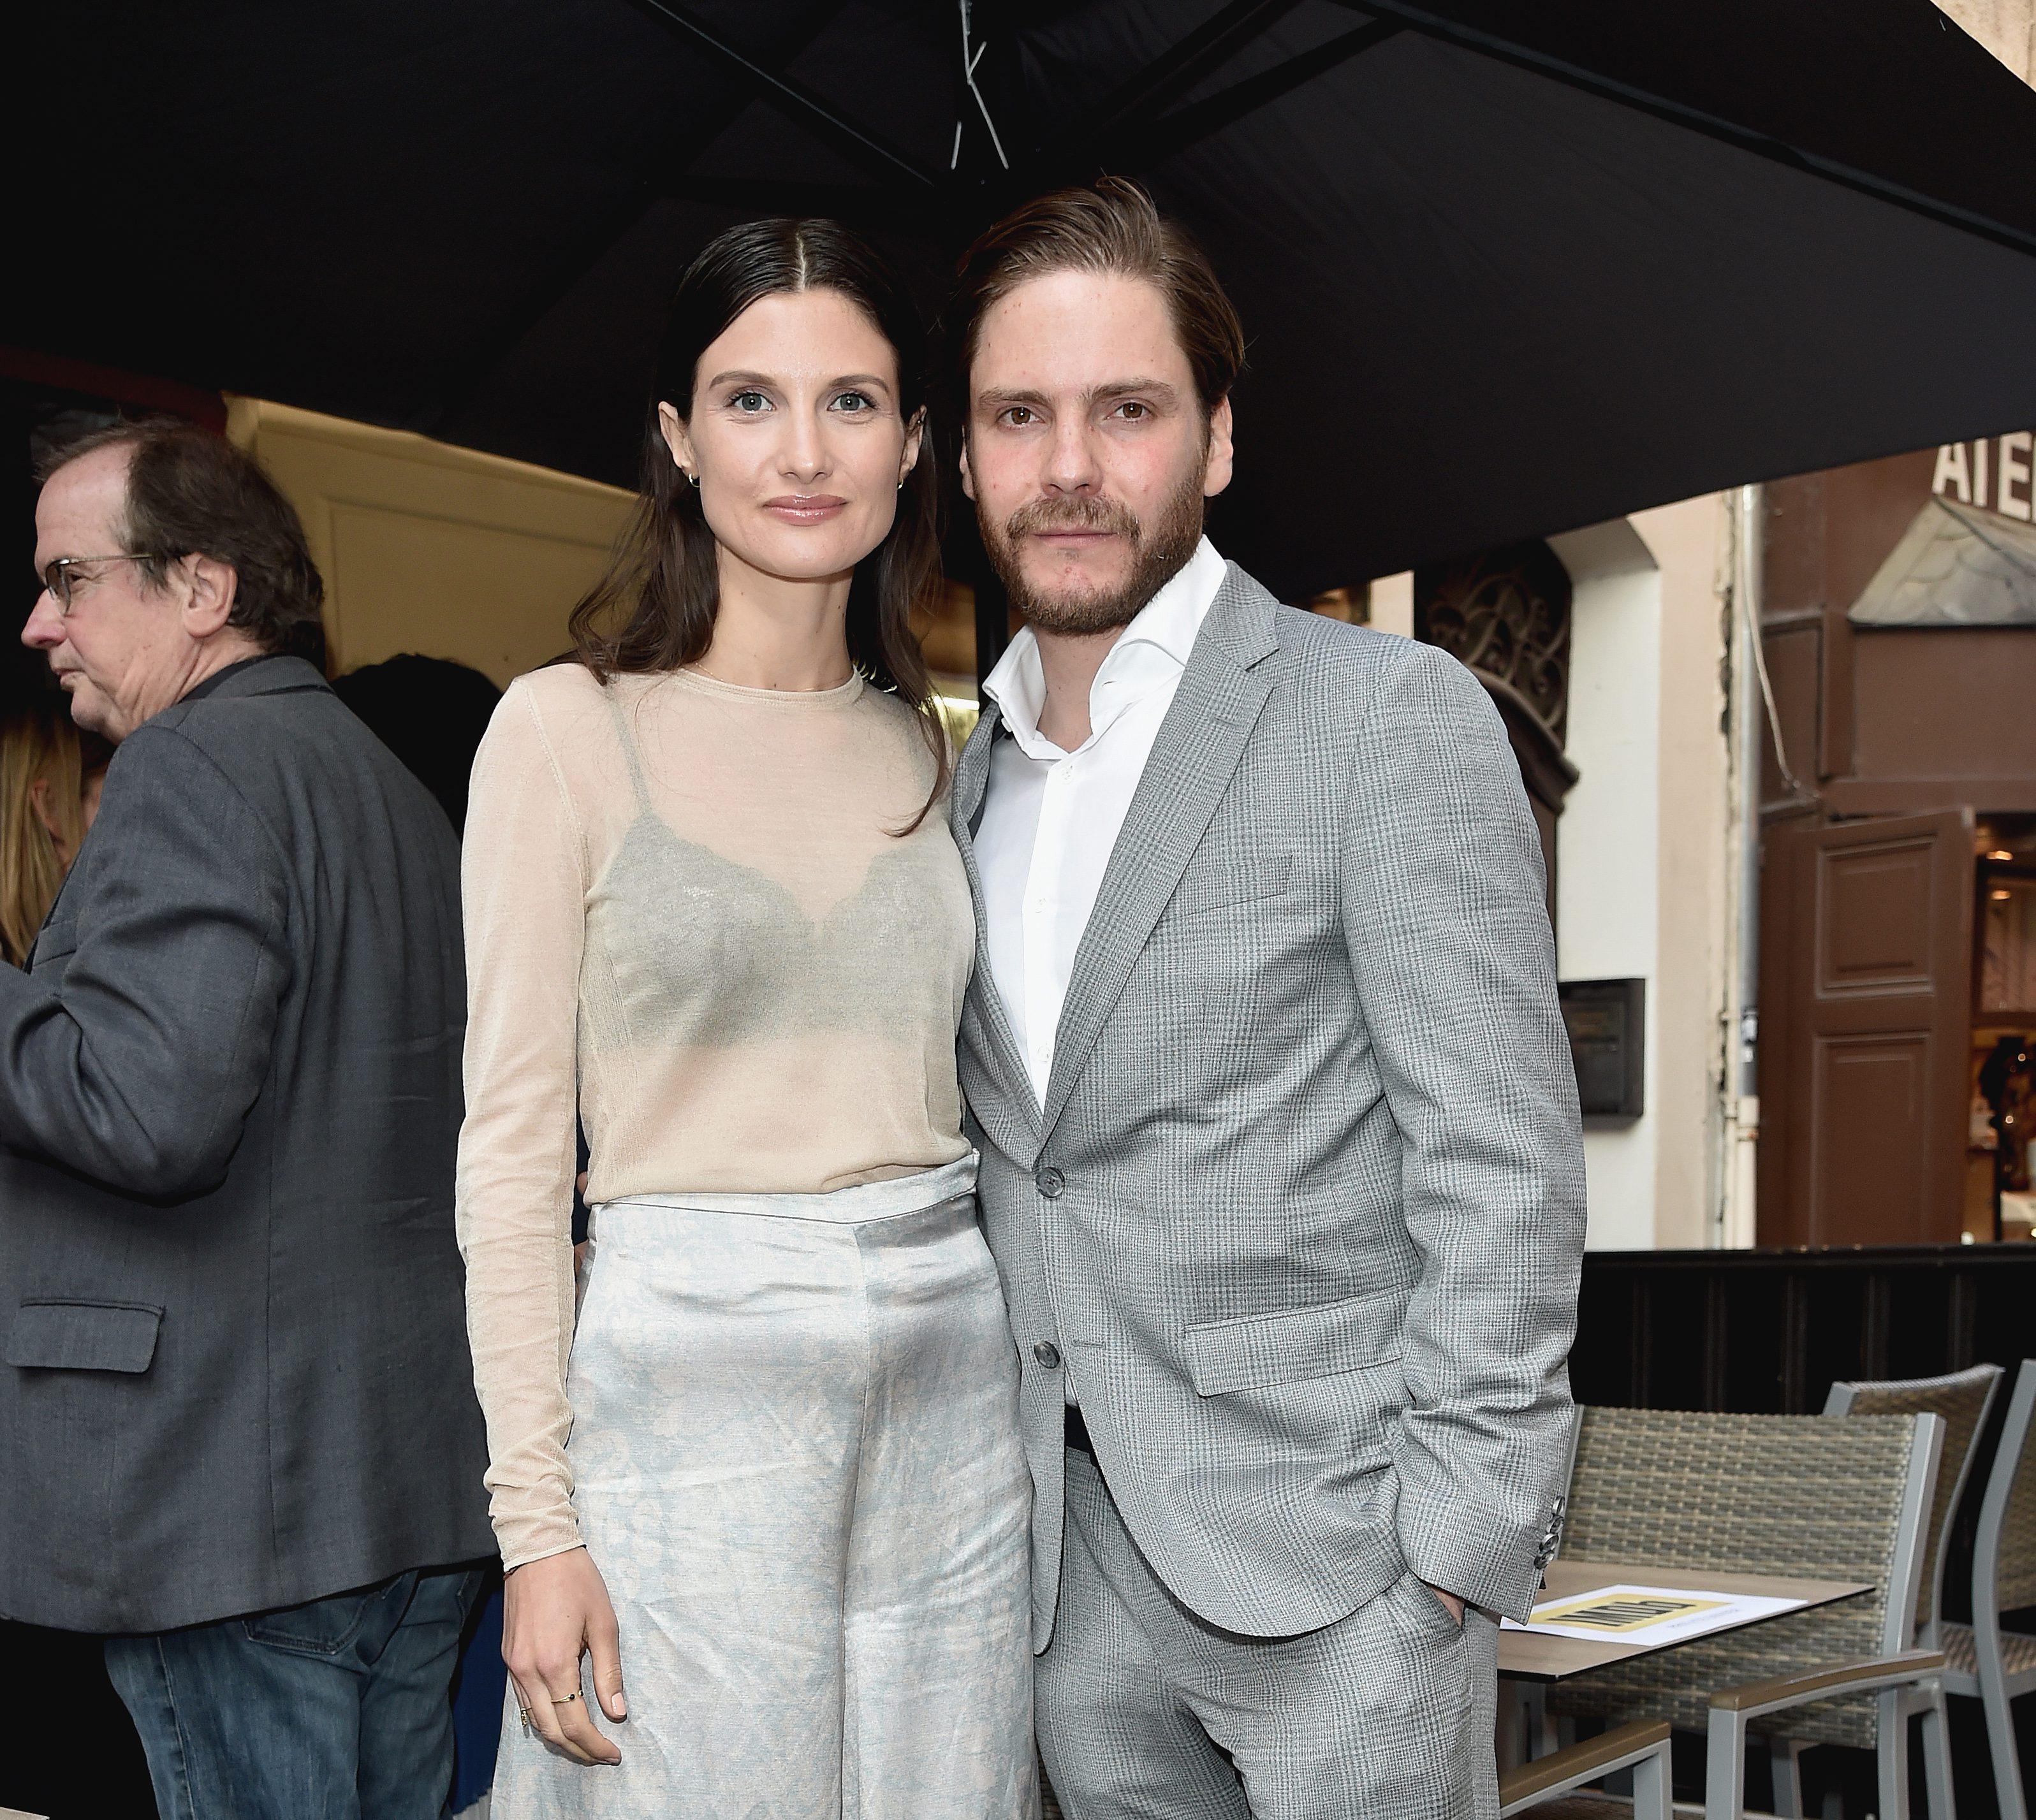 Daniel Bruhl wife girlfriend Felicitas Rombold